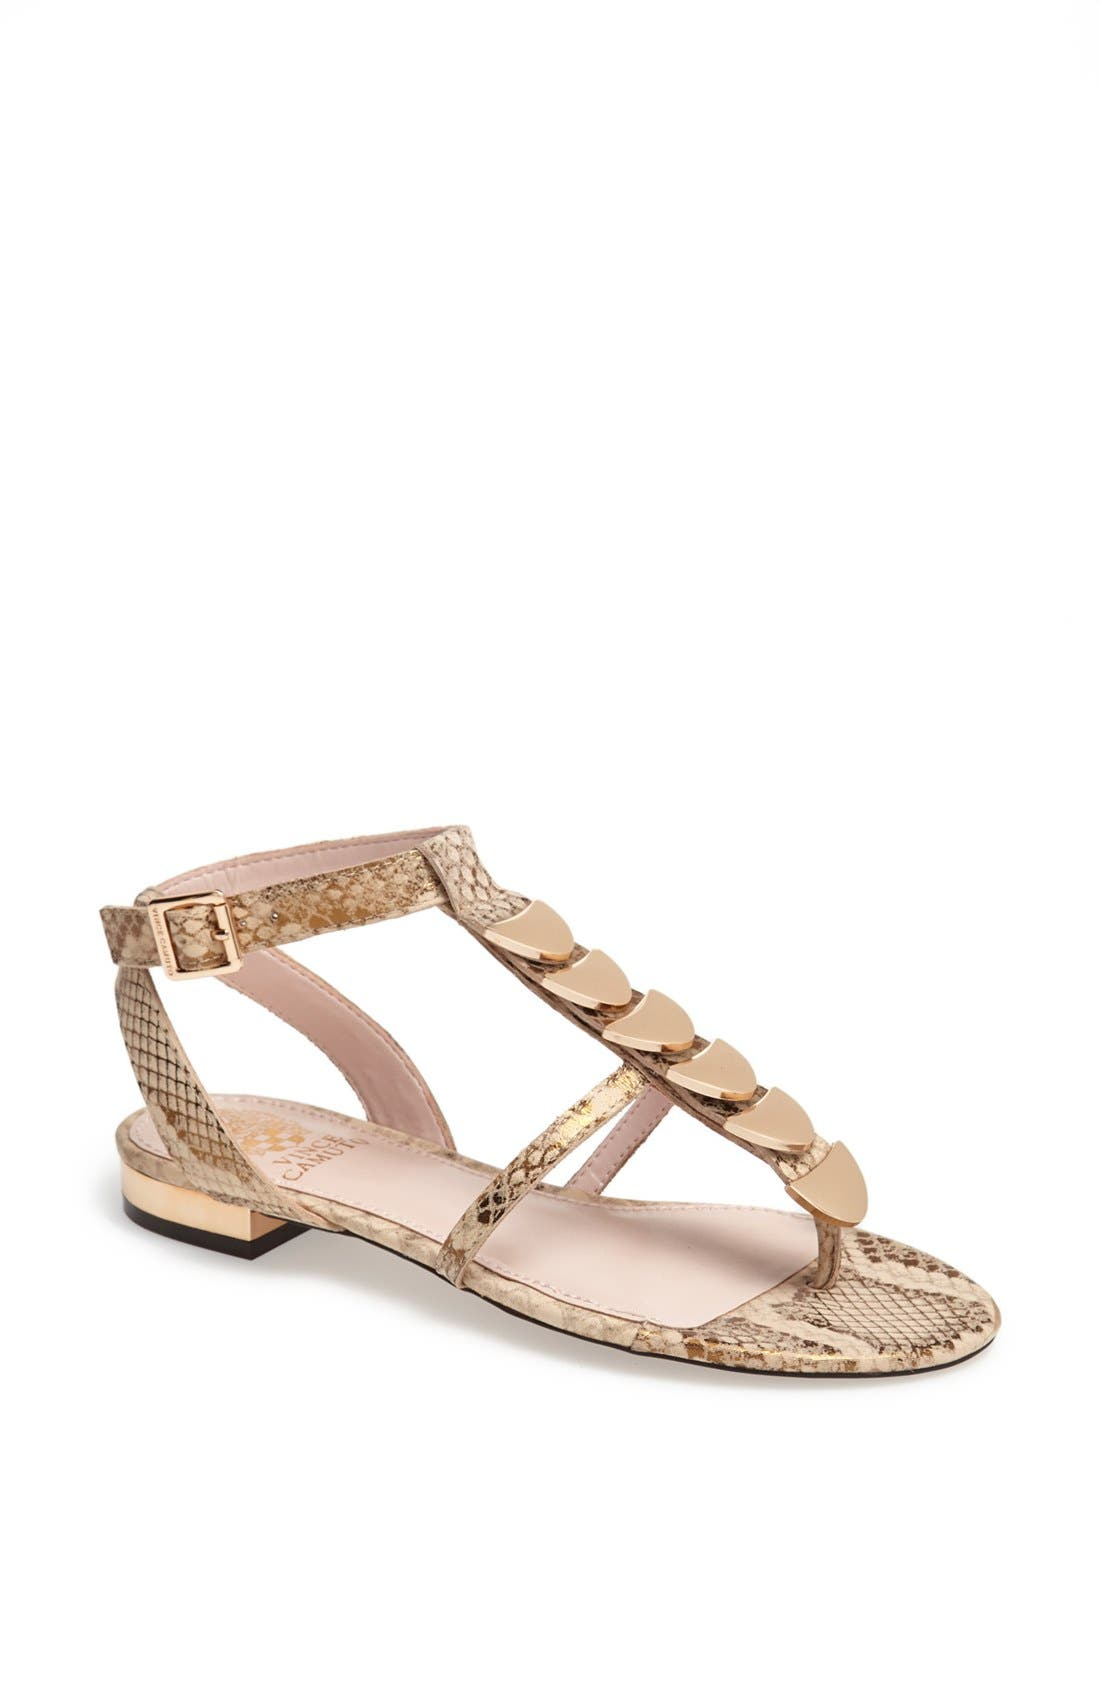 Main Image - Vince Camuto 'Himila' Sandal